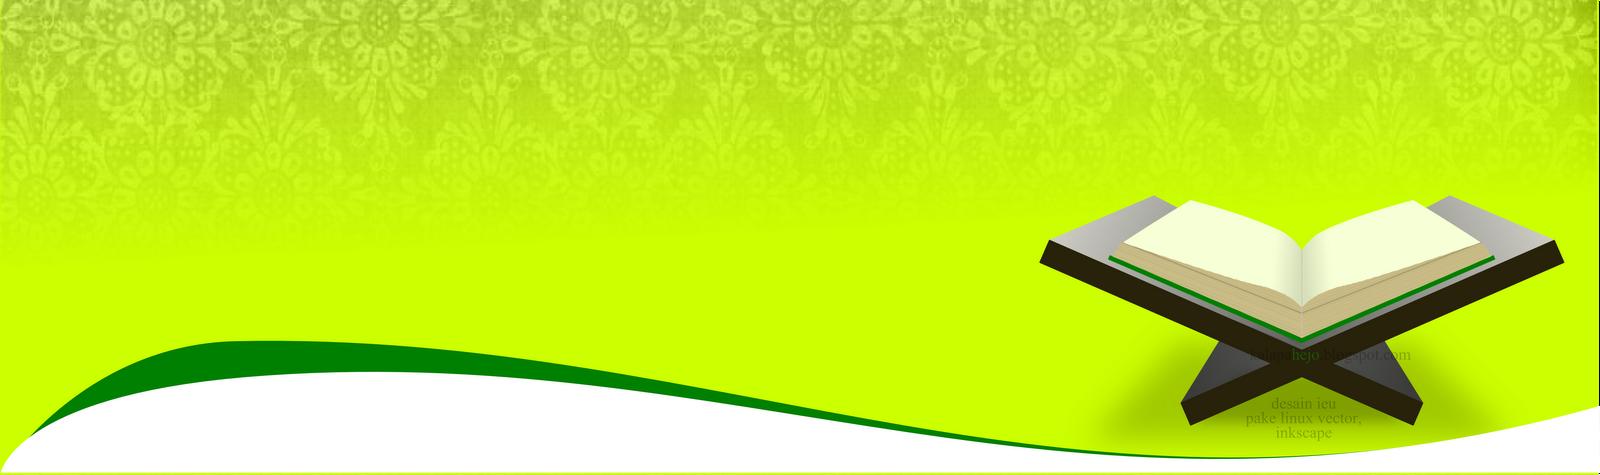 Rpp Silabus 2013 Download Rpp Dan Silabus Sd Mi Smp Mts Sma Ma Kurikulum 2013 Amien Rpp Ips Berkarakter Smp Rpp Ips Berkarakter Smp Kelas Vii